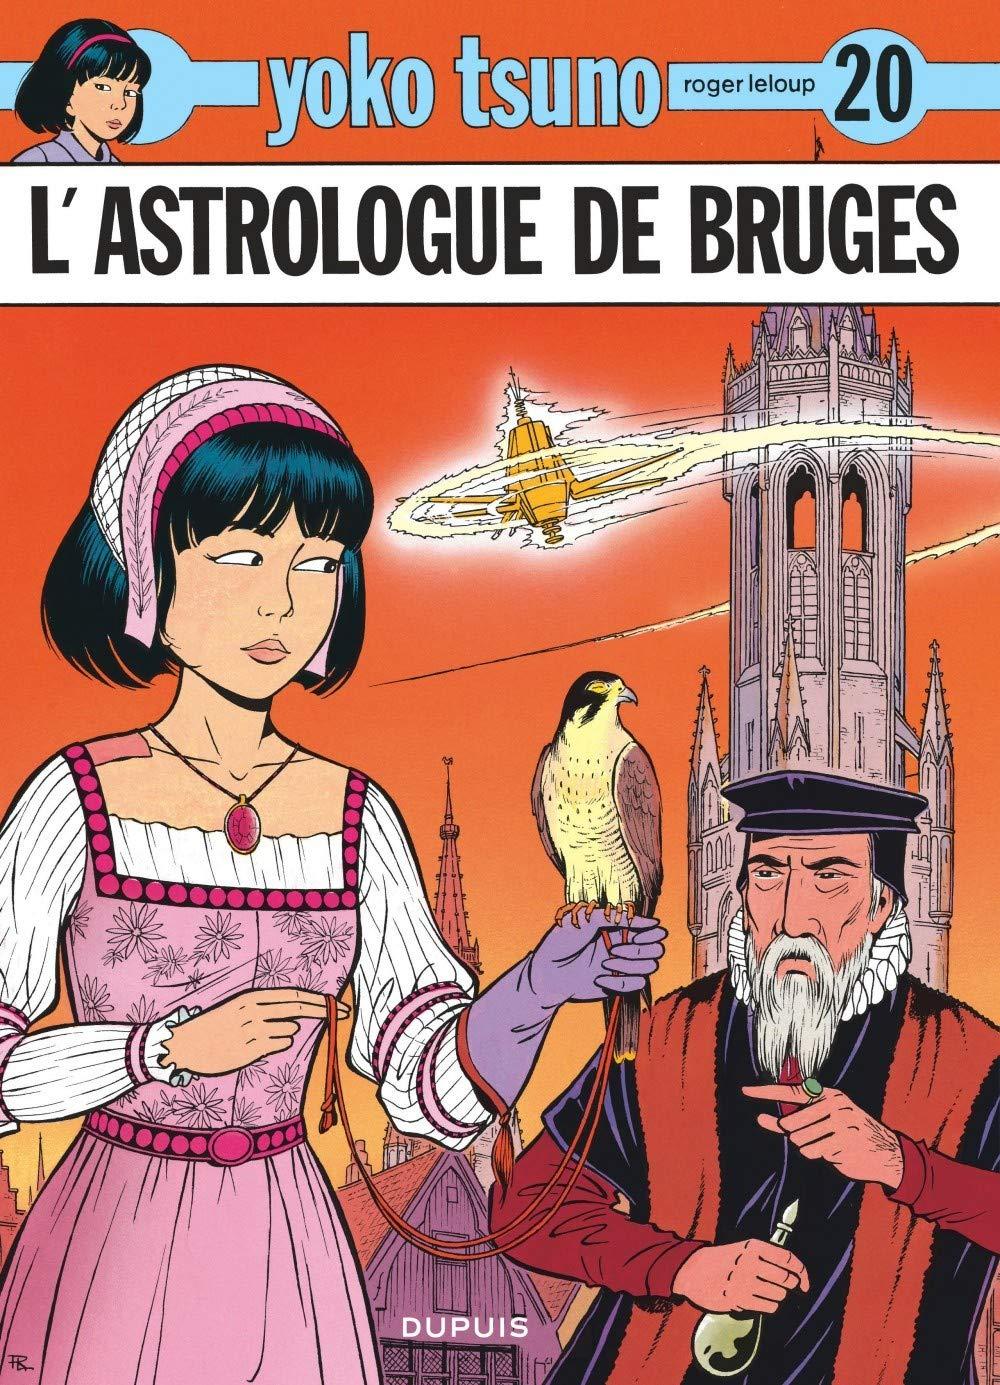 Yoko Tsuno Tome 20 L Astrologue De Bruges Amazon Es Leloup Leloup Libros En Idiomas Extranjeros